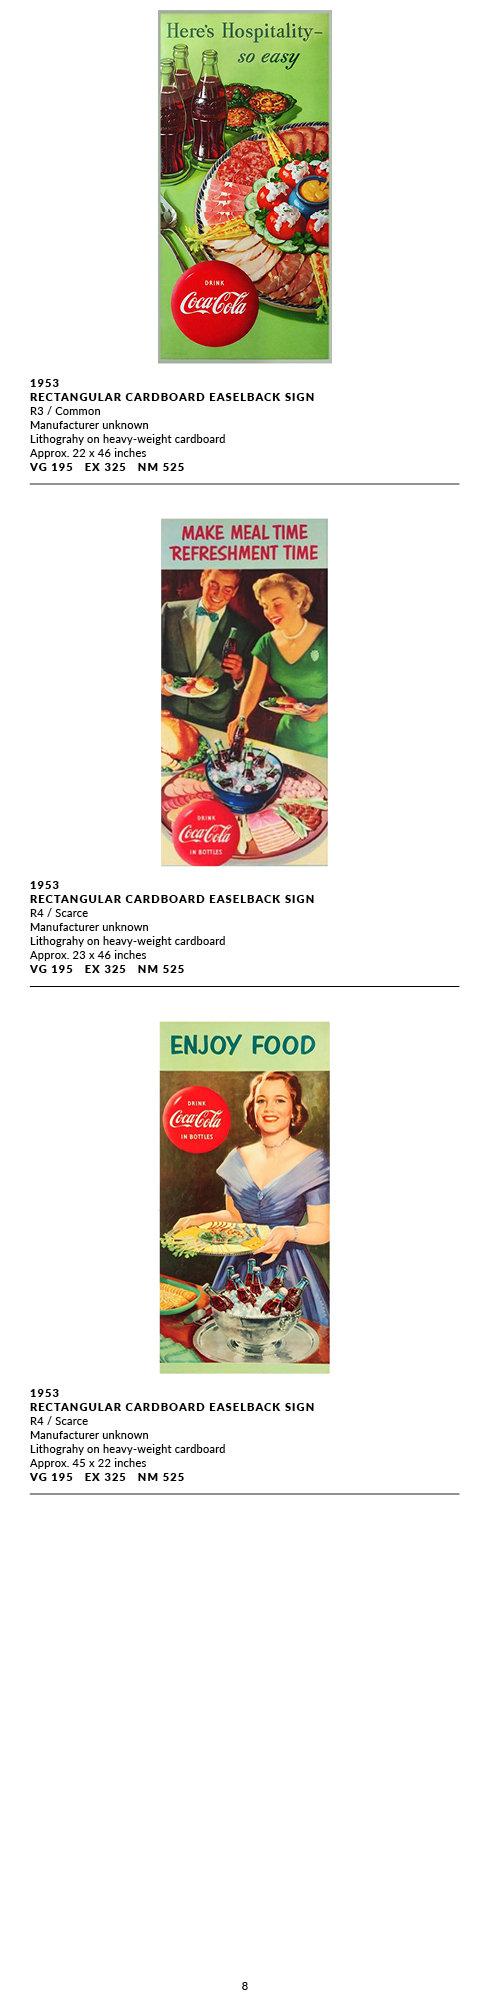 2018_1940-1969RectCardboards8.jpg